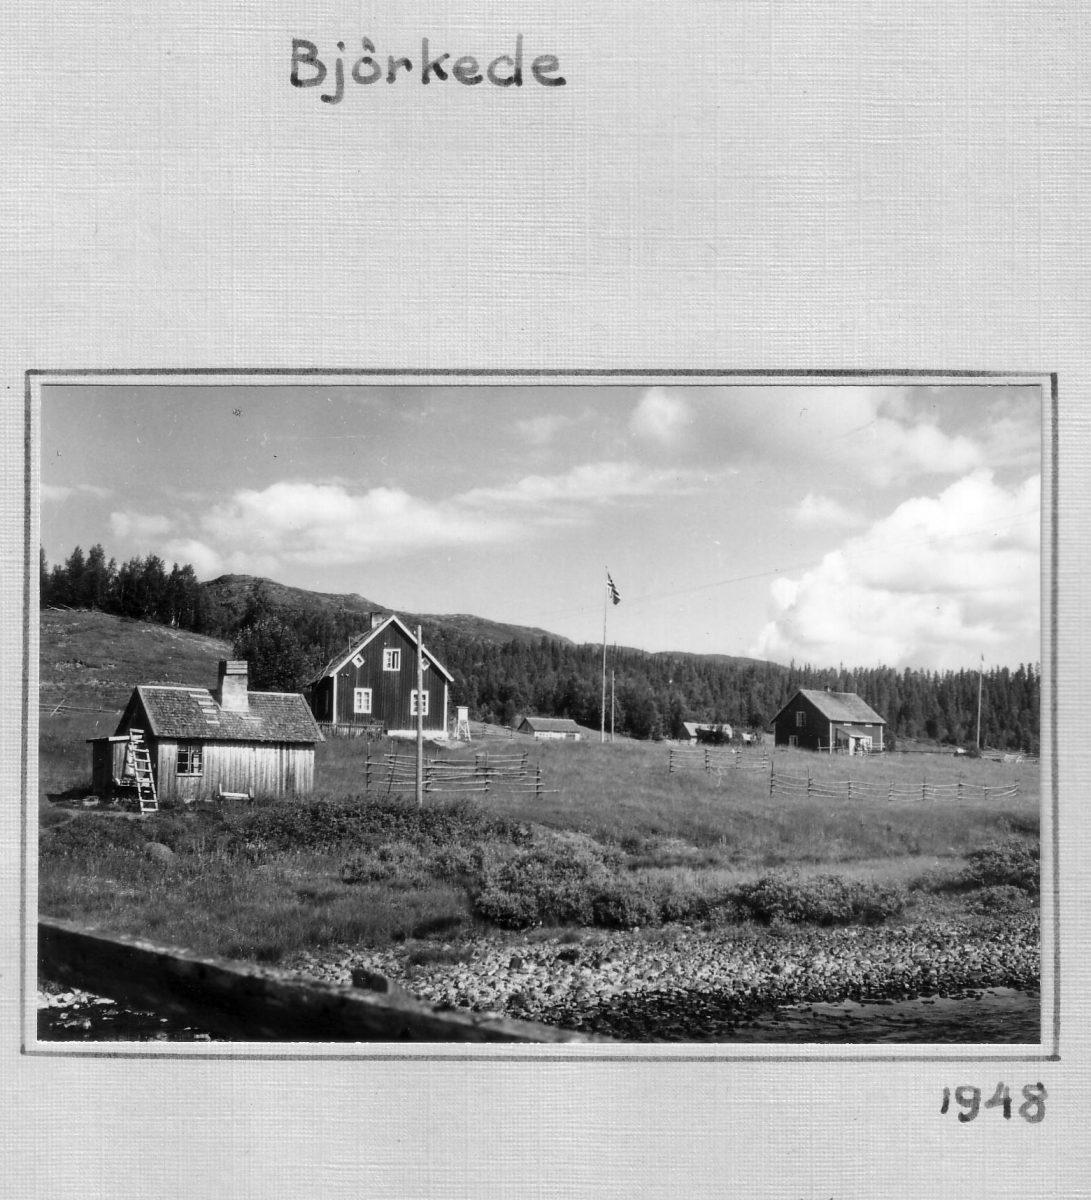 S.71 Björkede 1948